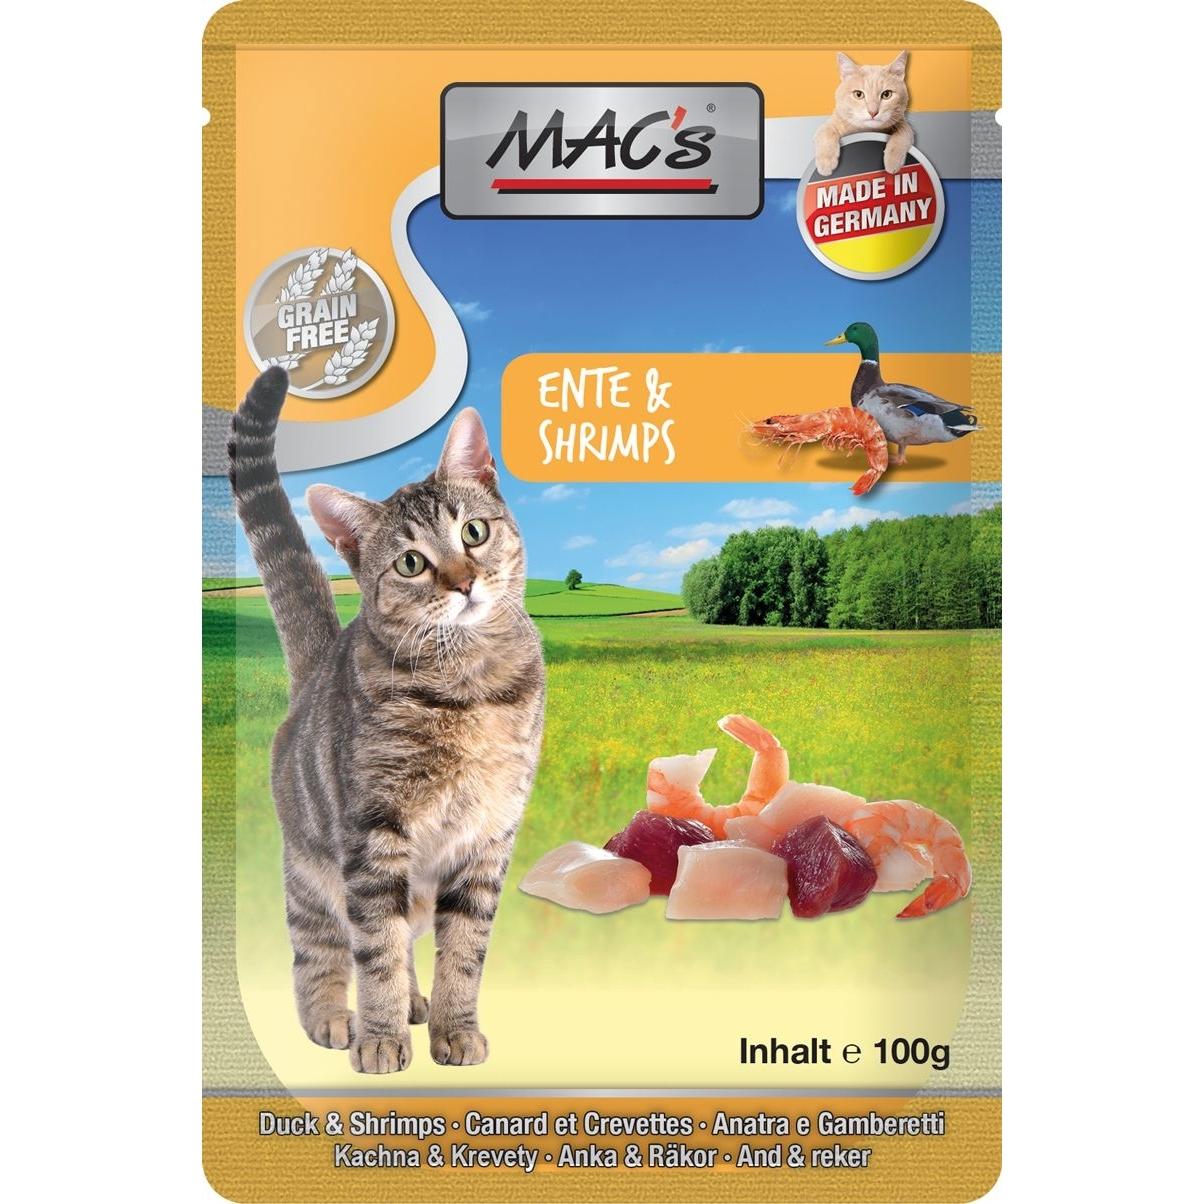 MACs Cat Pouch Pack Frischebeutel, Bild 4